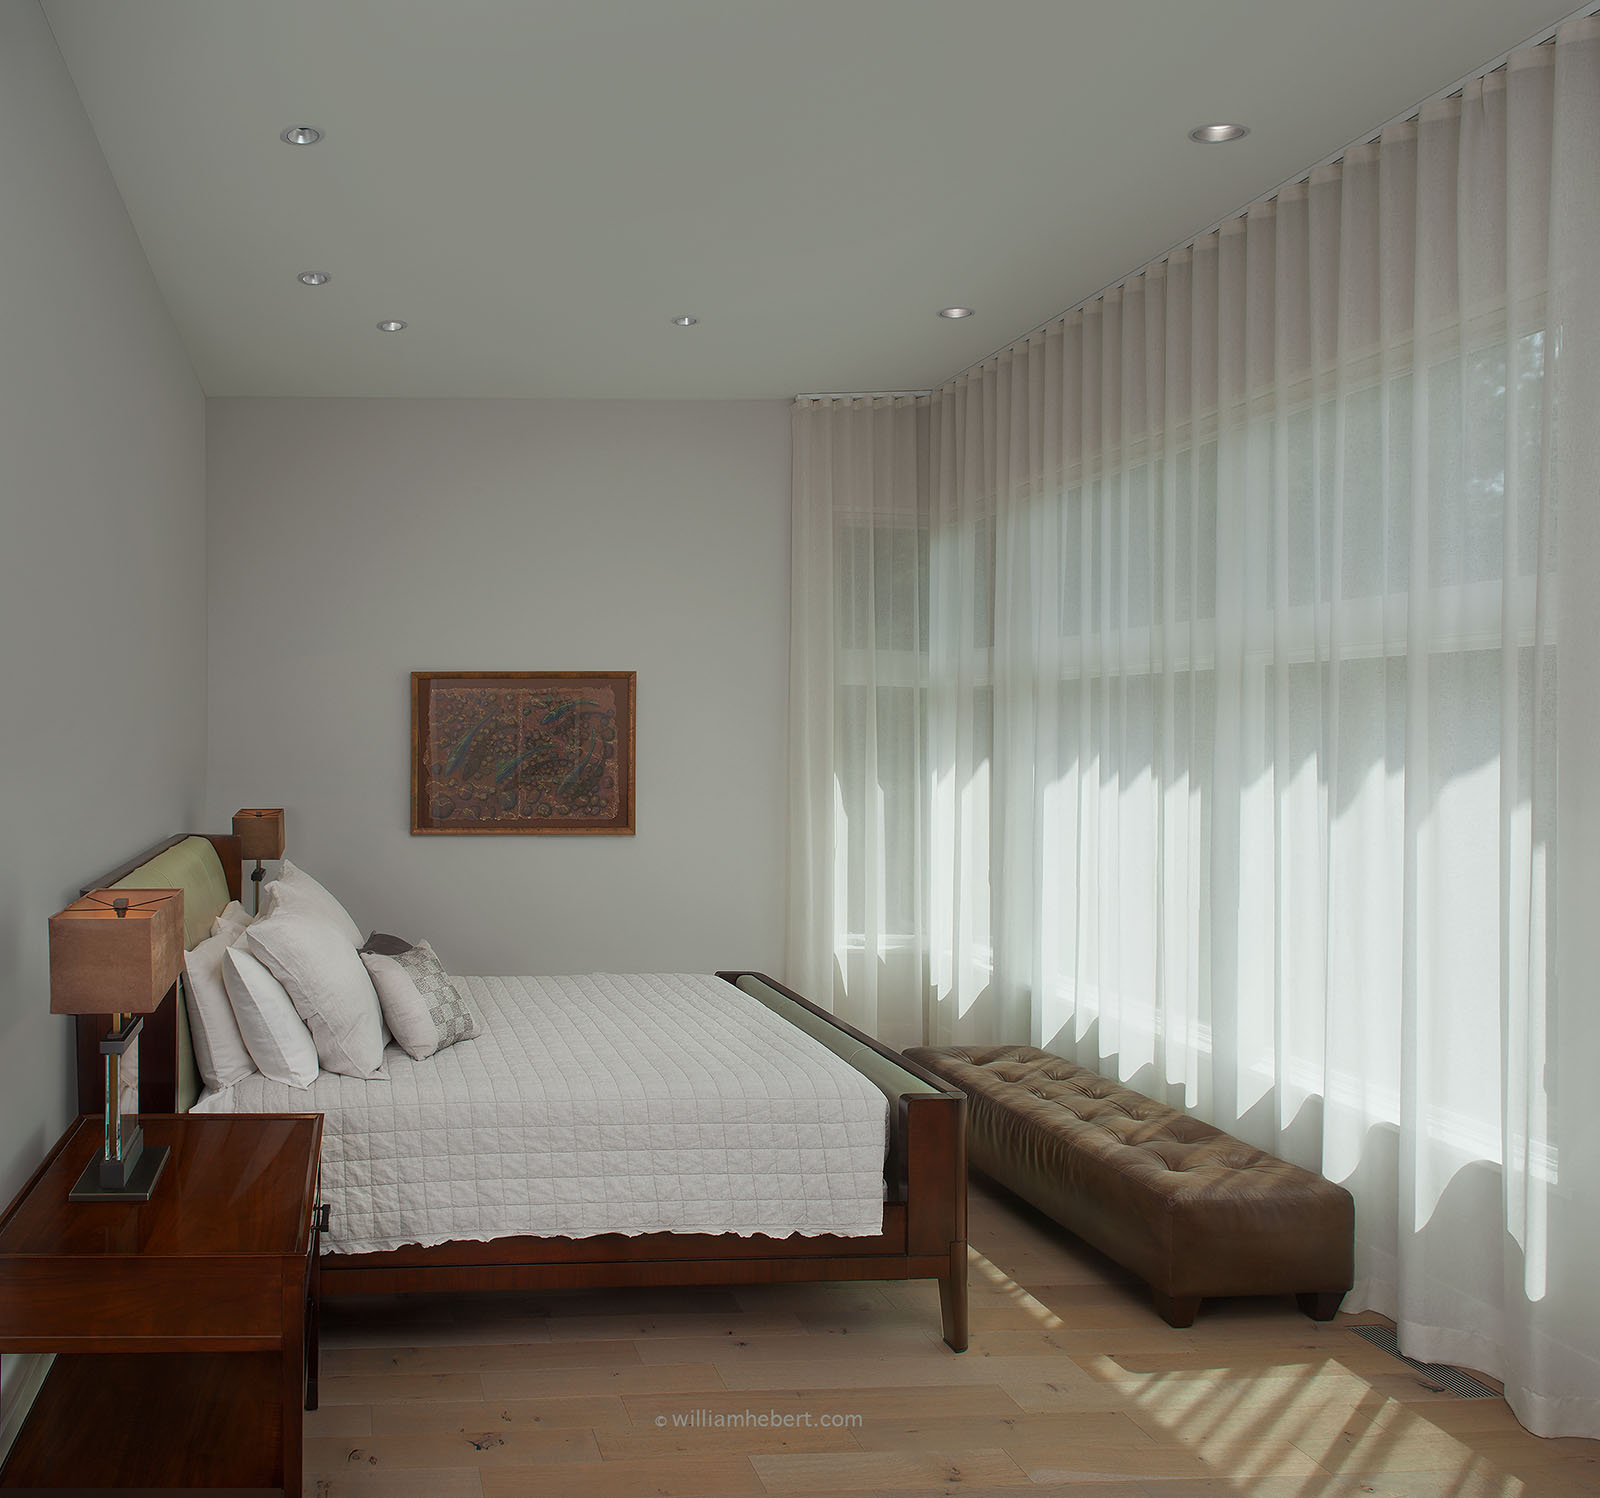 Architecture_Interior_8.jpg